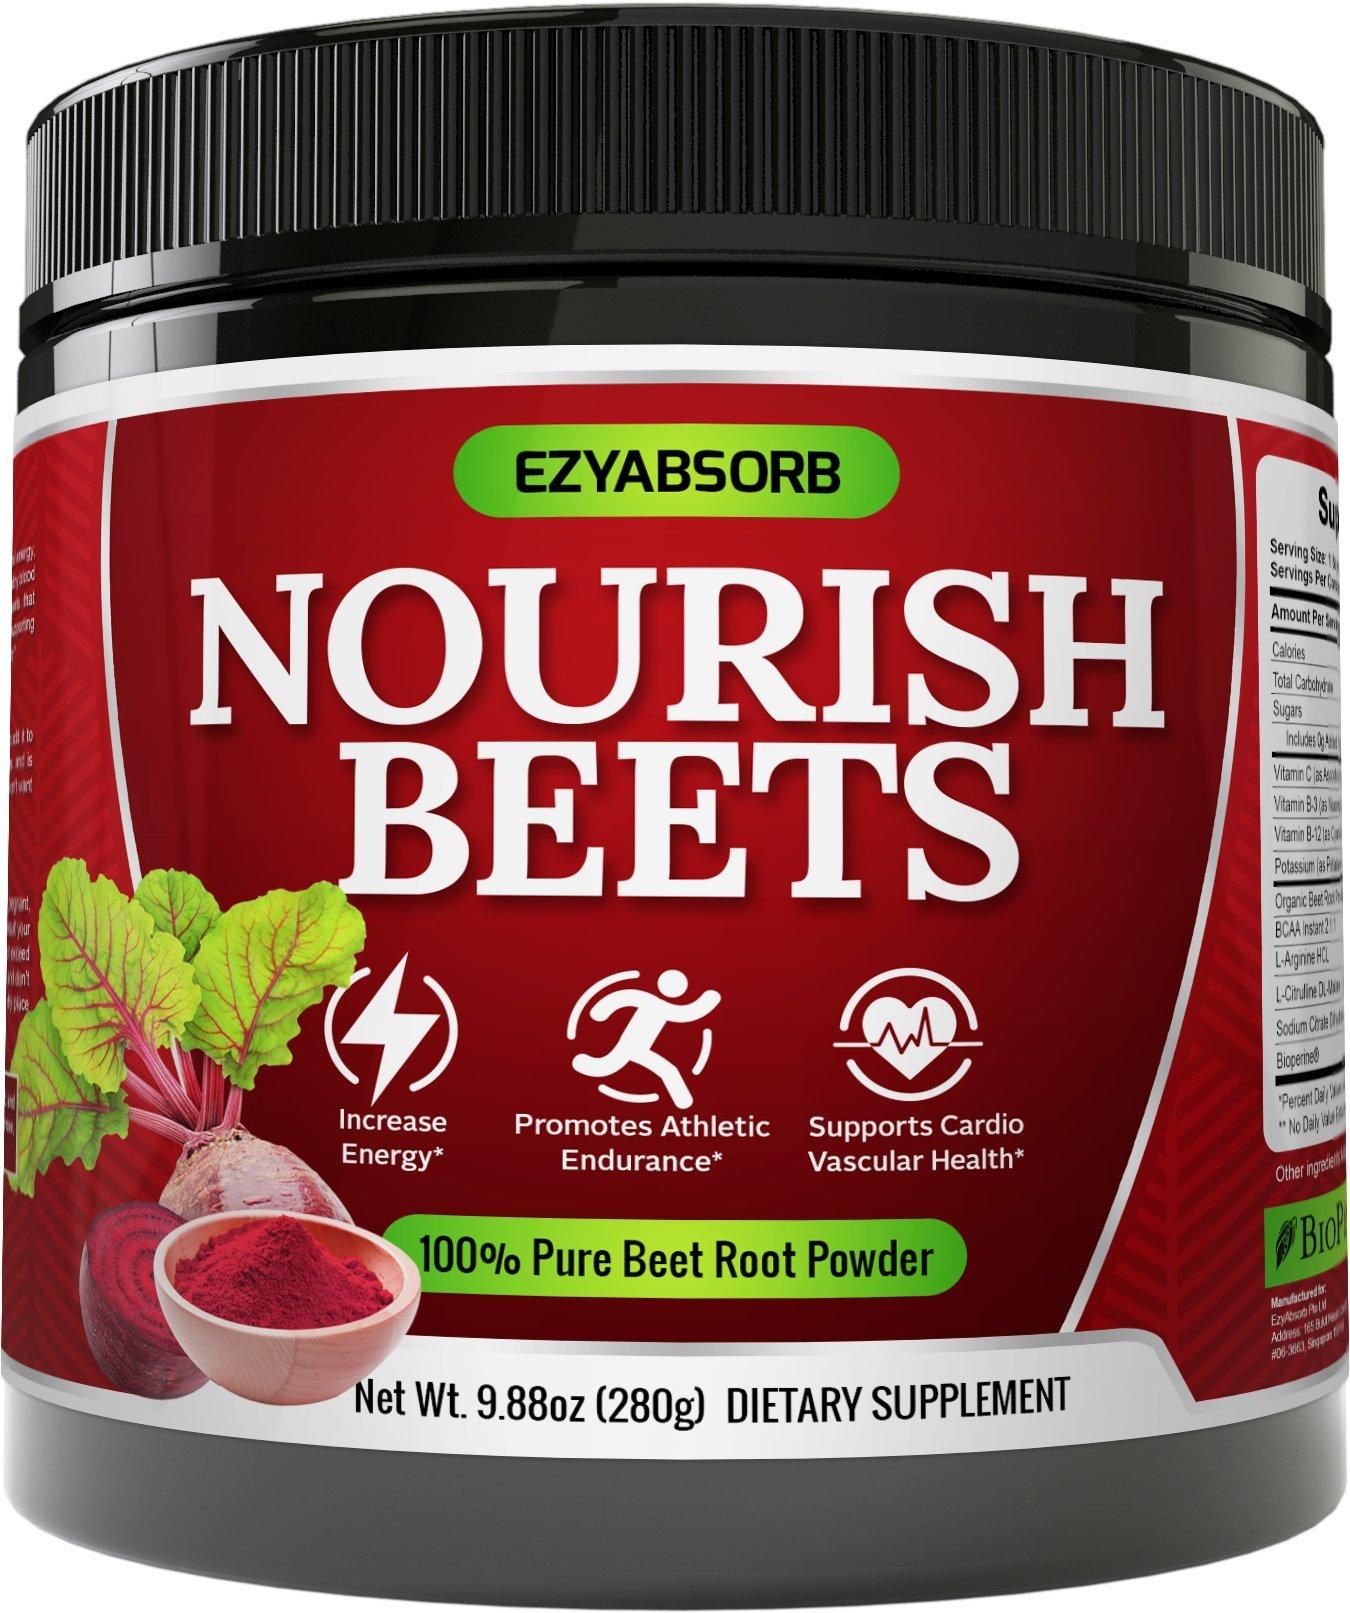 EzyAbsorb Beet Root Powder - Organic Beet Root Juice Powder + BCAA Amino Acids, Vitamins C, B3, B12 + L-Arginine HCL + L-Citrulline Dl-Malate + Bioperine | Nitric Oxide Booster Supplement | Non-GMO Hy by EzyAbsorb